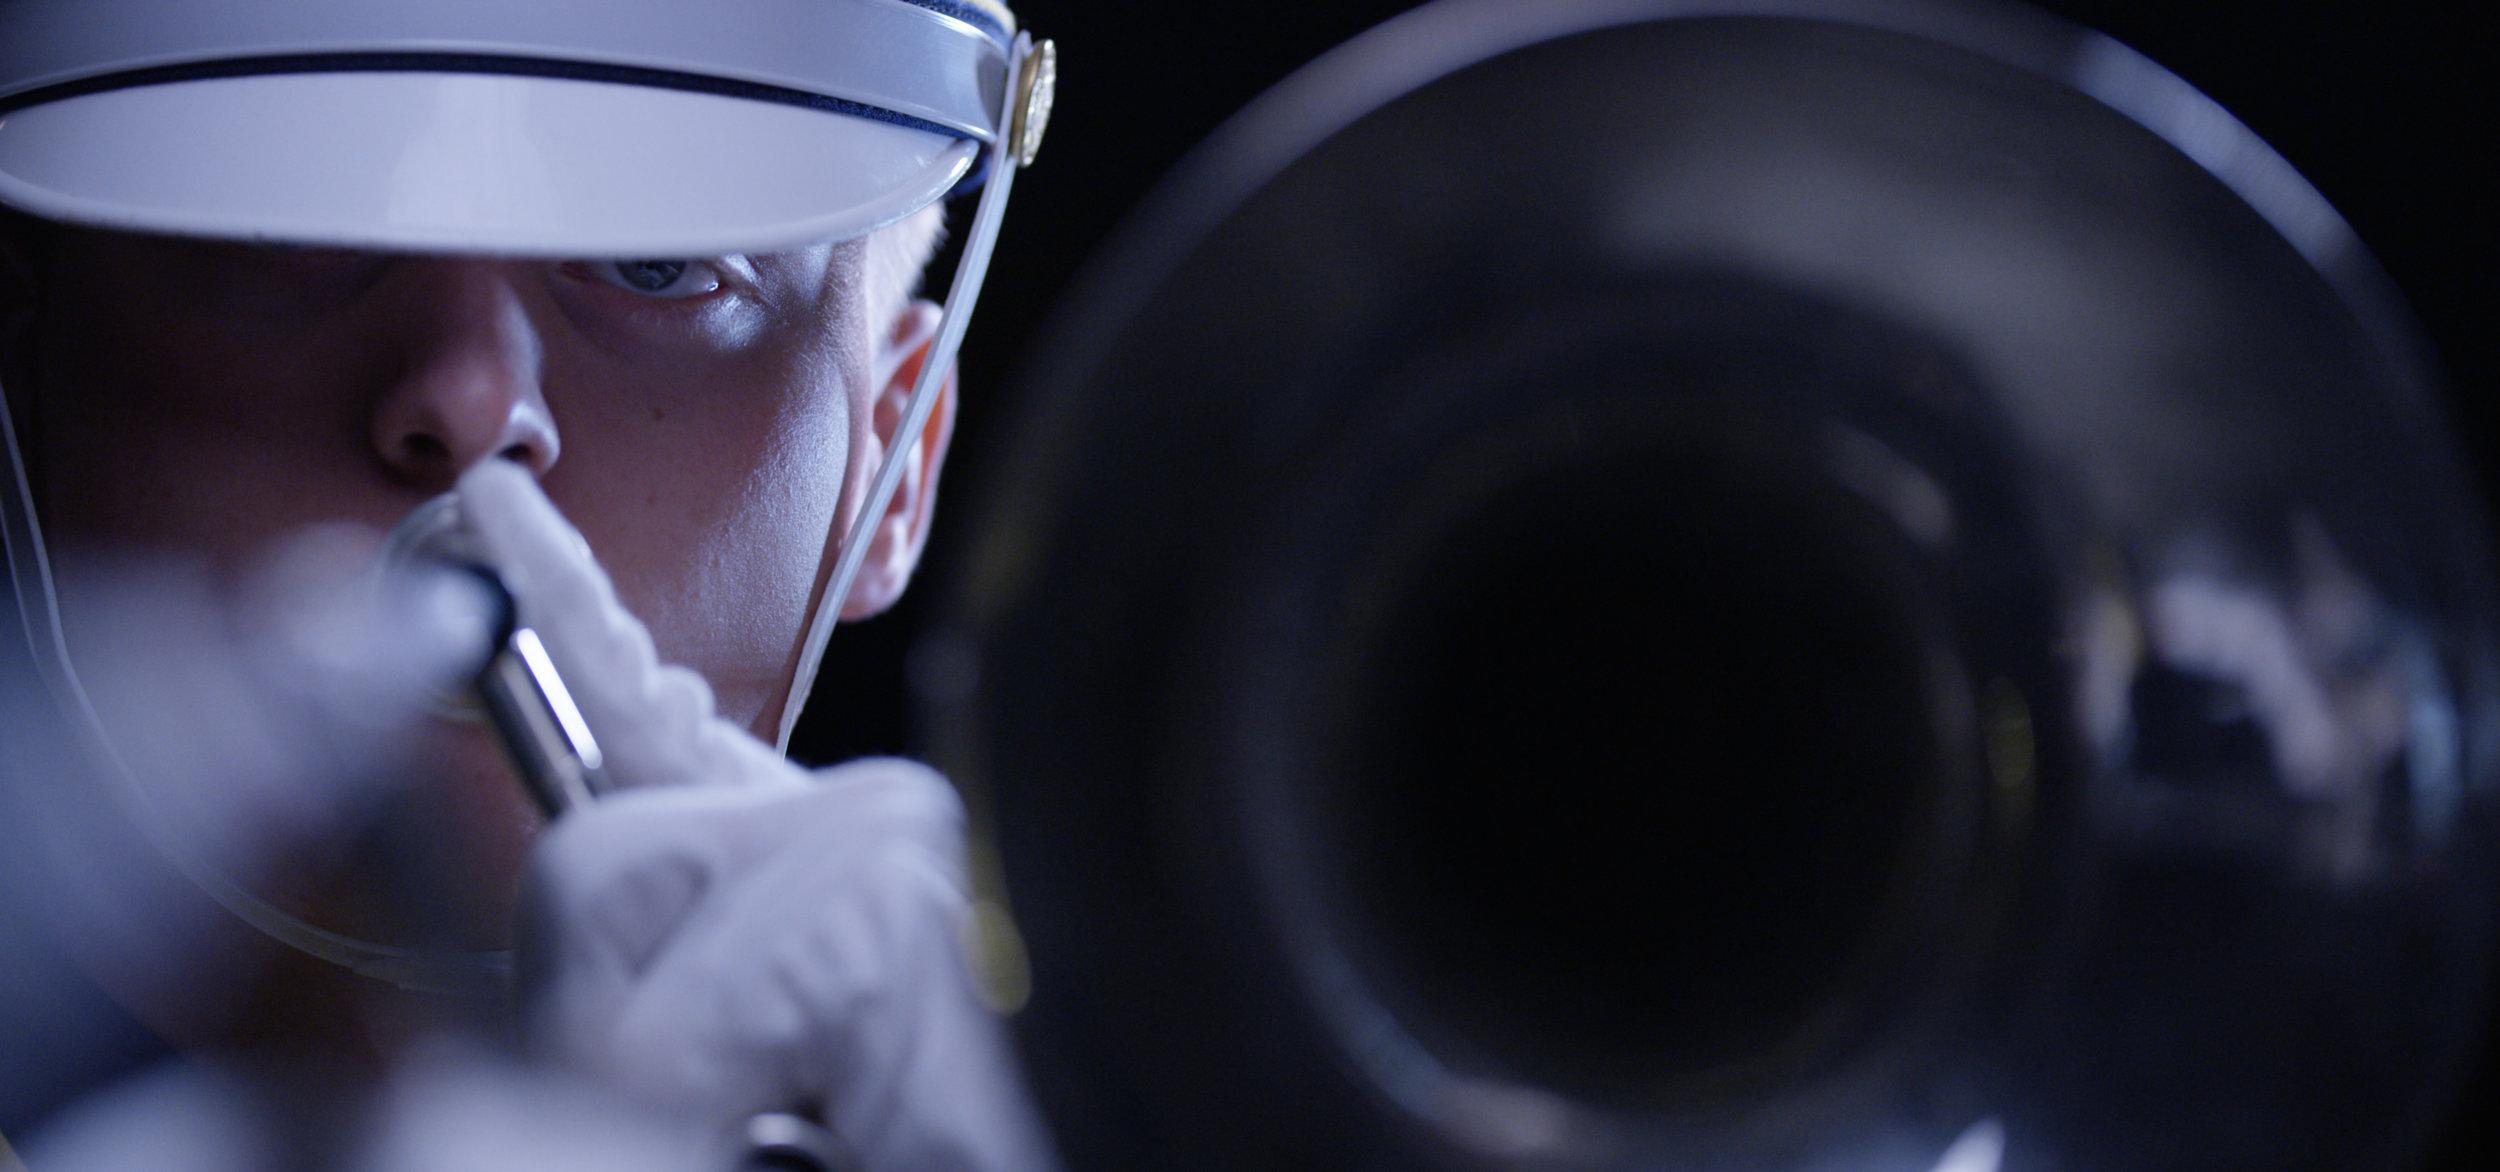 MMB Trombone CU 2.jpg